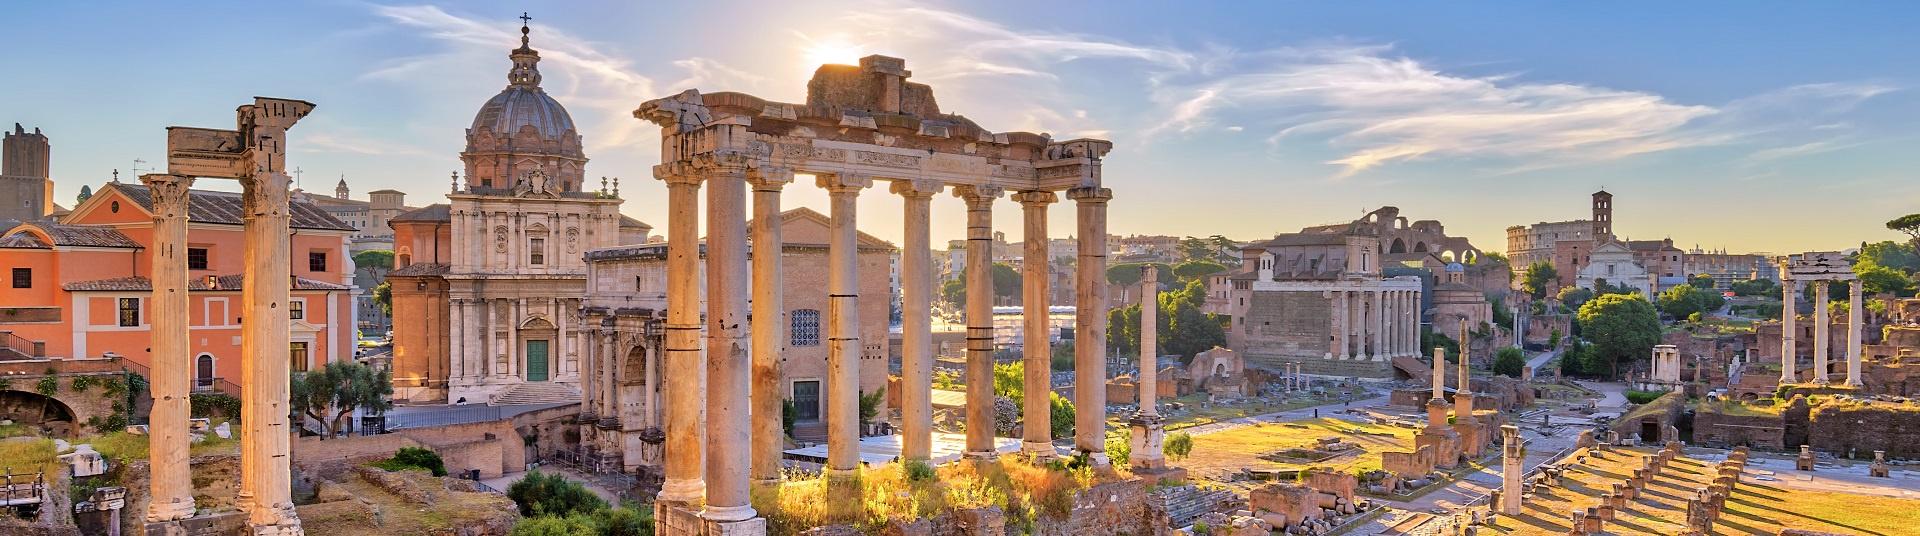 Week-end pas cher Rome